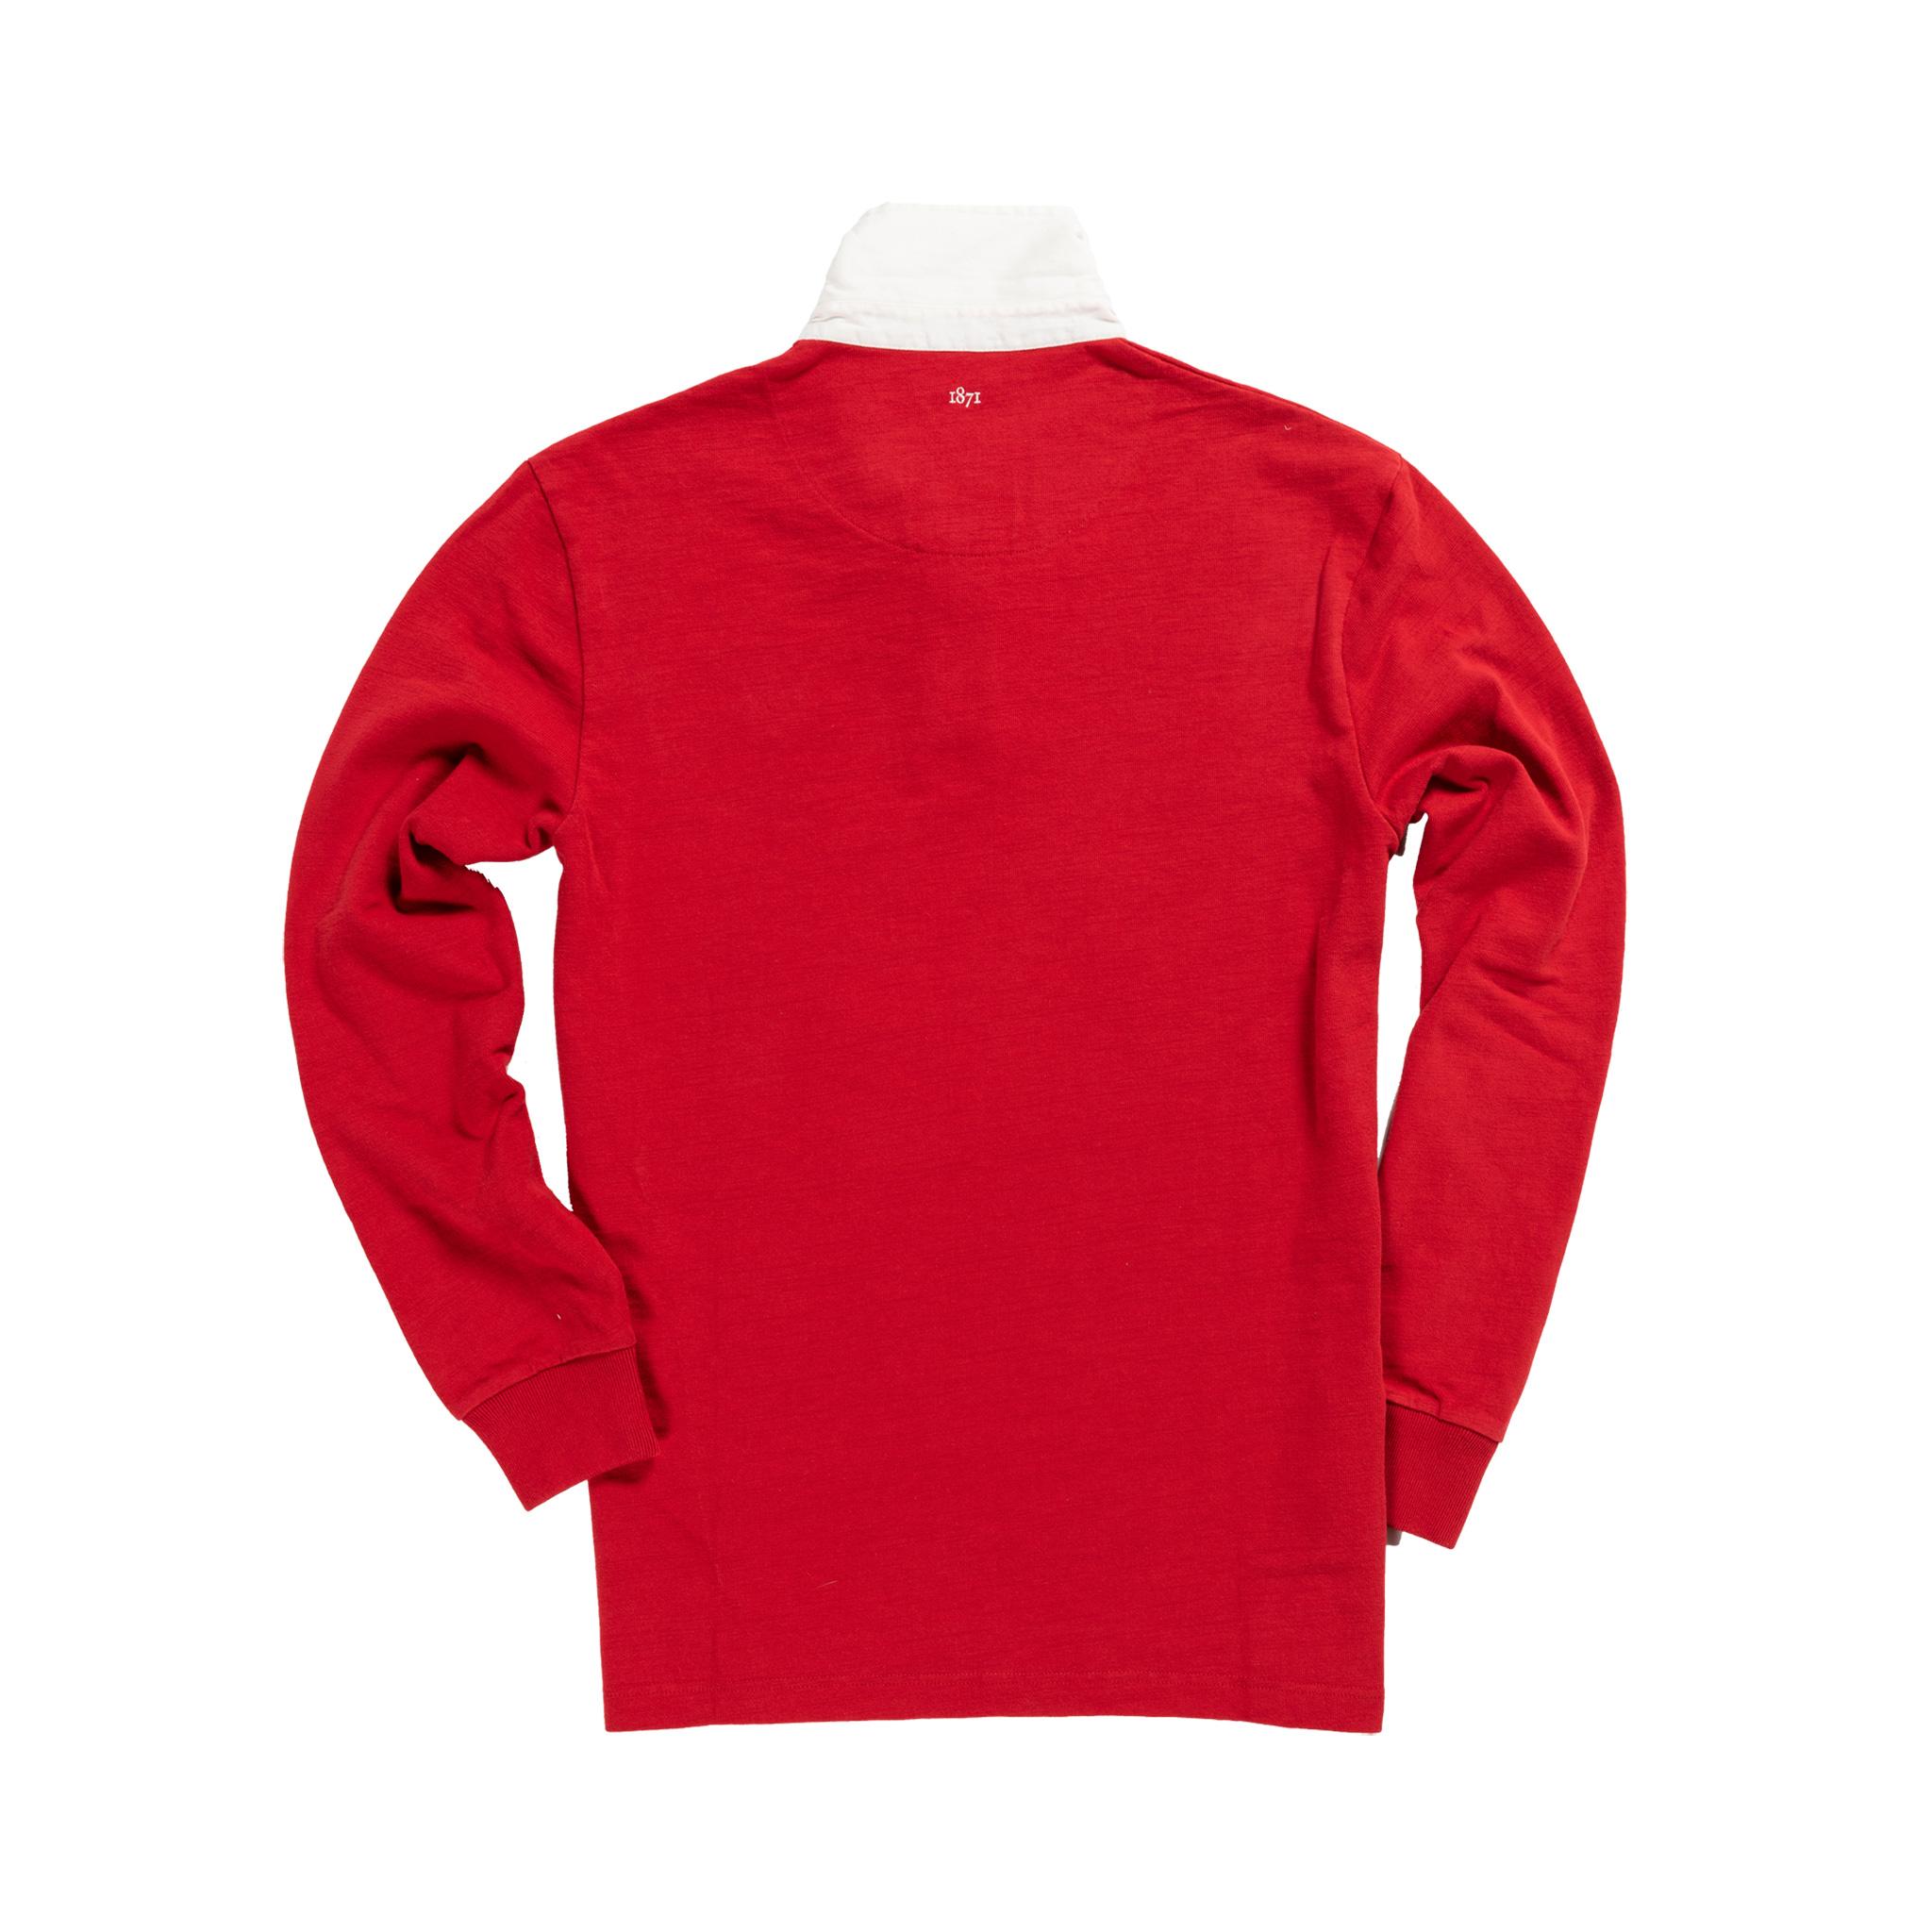 Wales 1881 Vintage Rugby Shirt